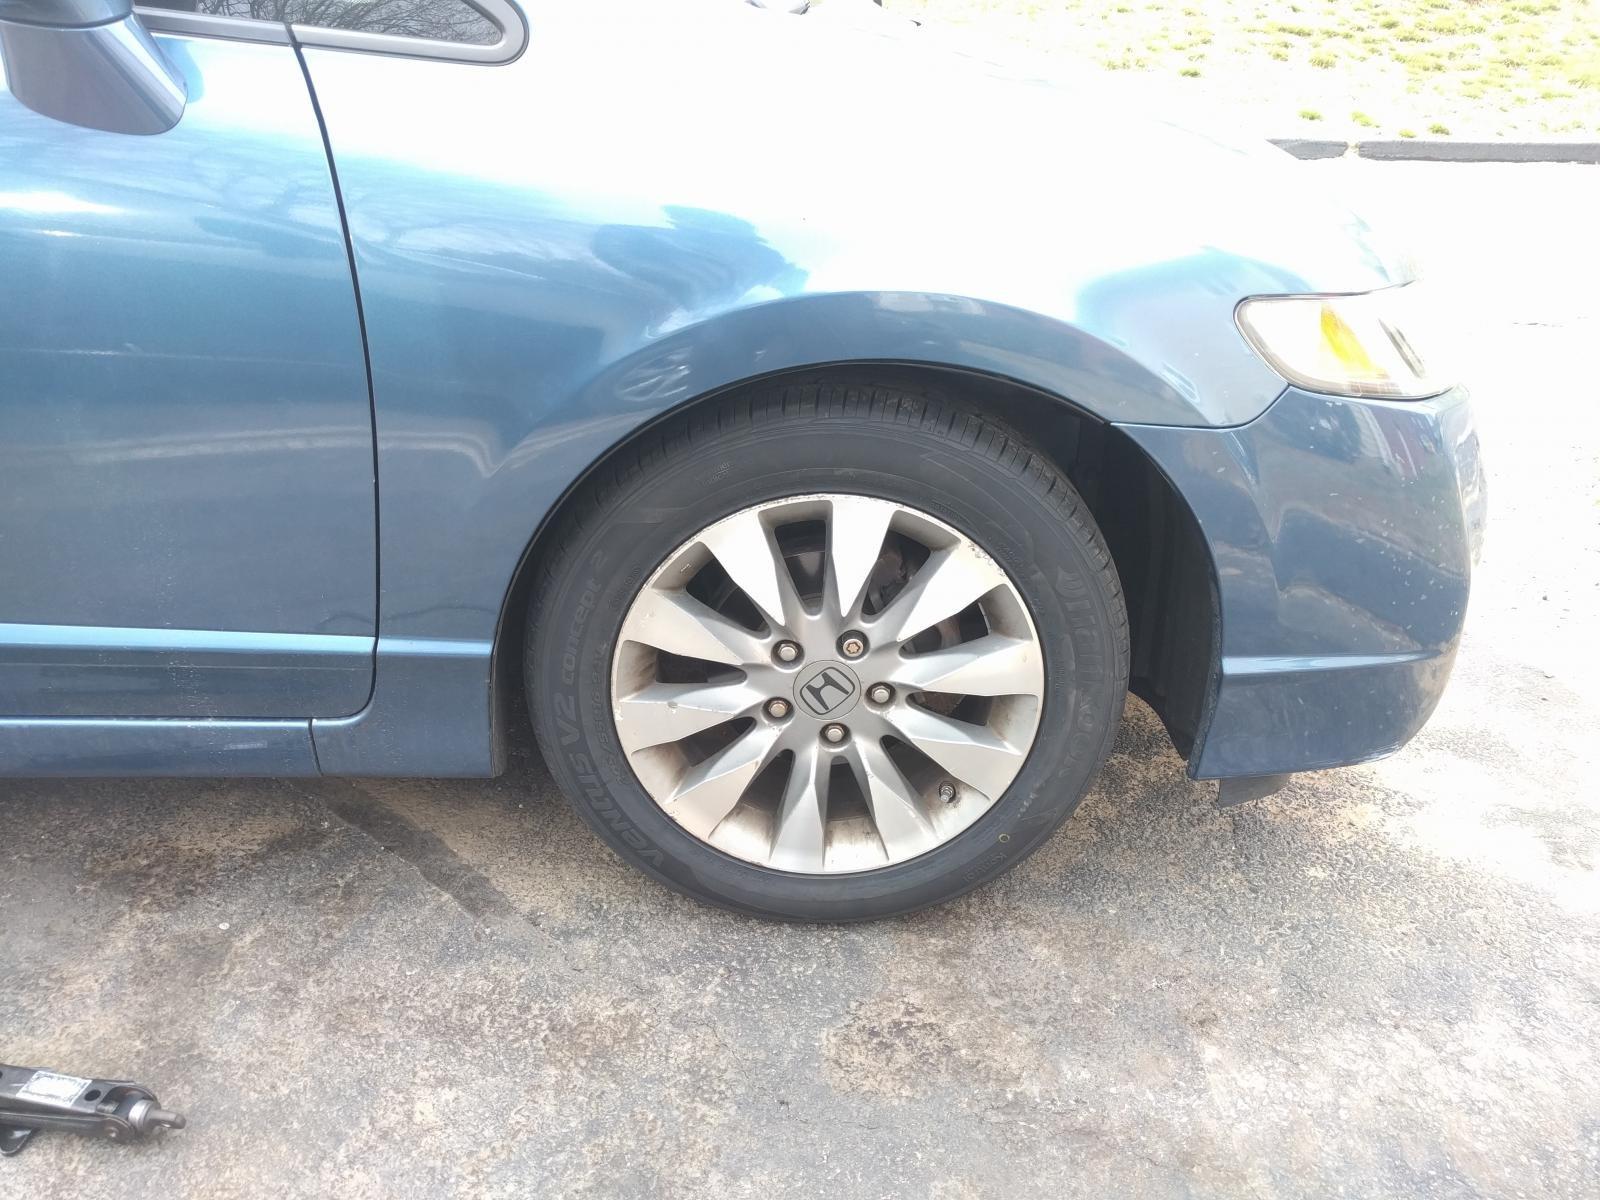 2009 Civic Sedan hit curb. Front Passenger side Suspension Replacement!-img_20190407_152624.jpg